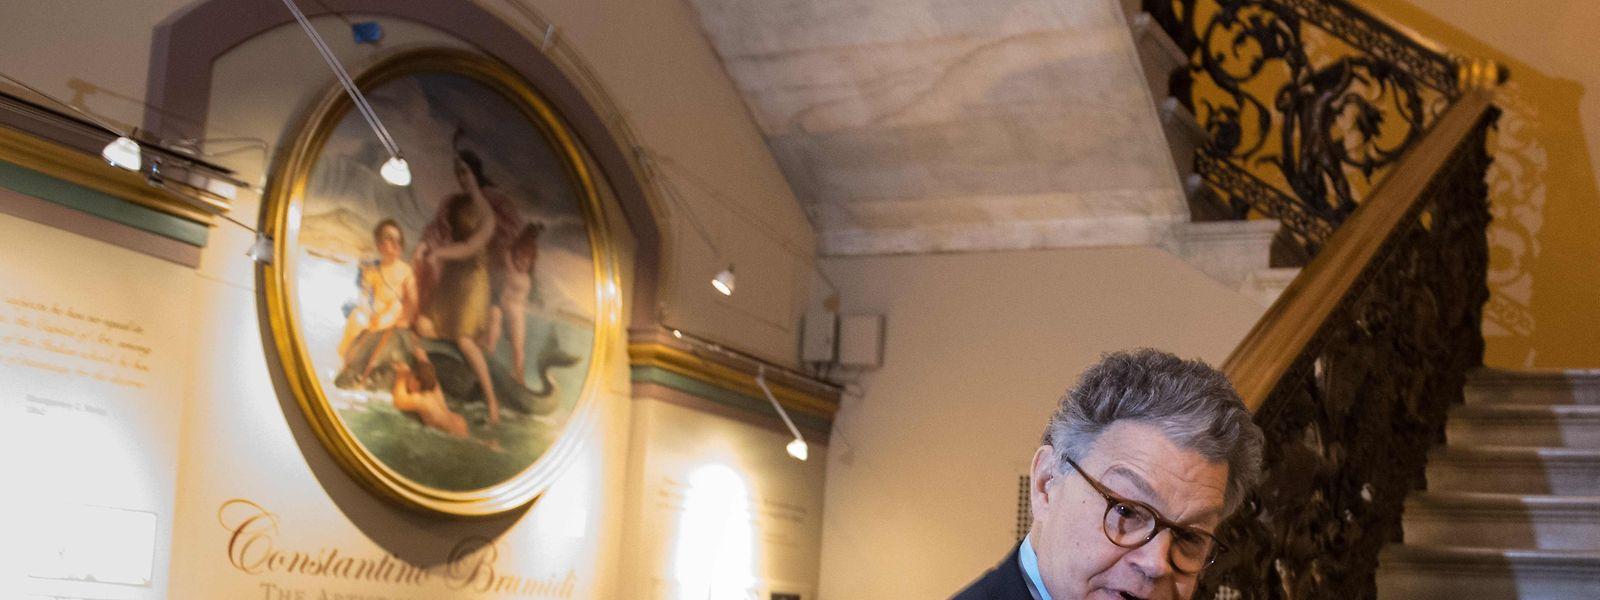 Senator Al Franken am Donnerstag bei seiner Ankunft im Kapitol.